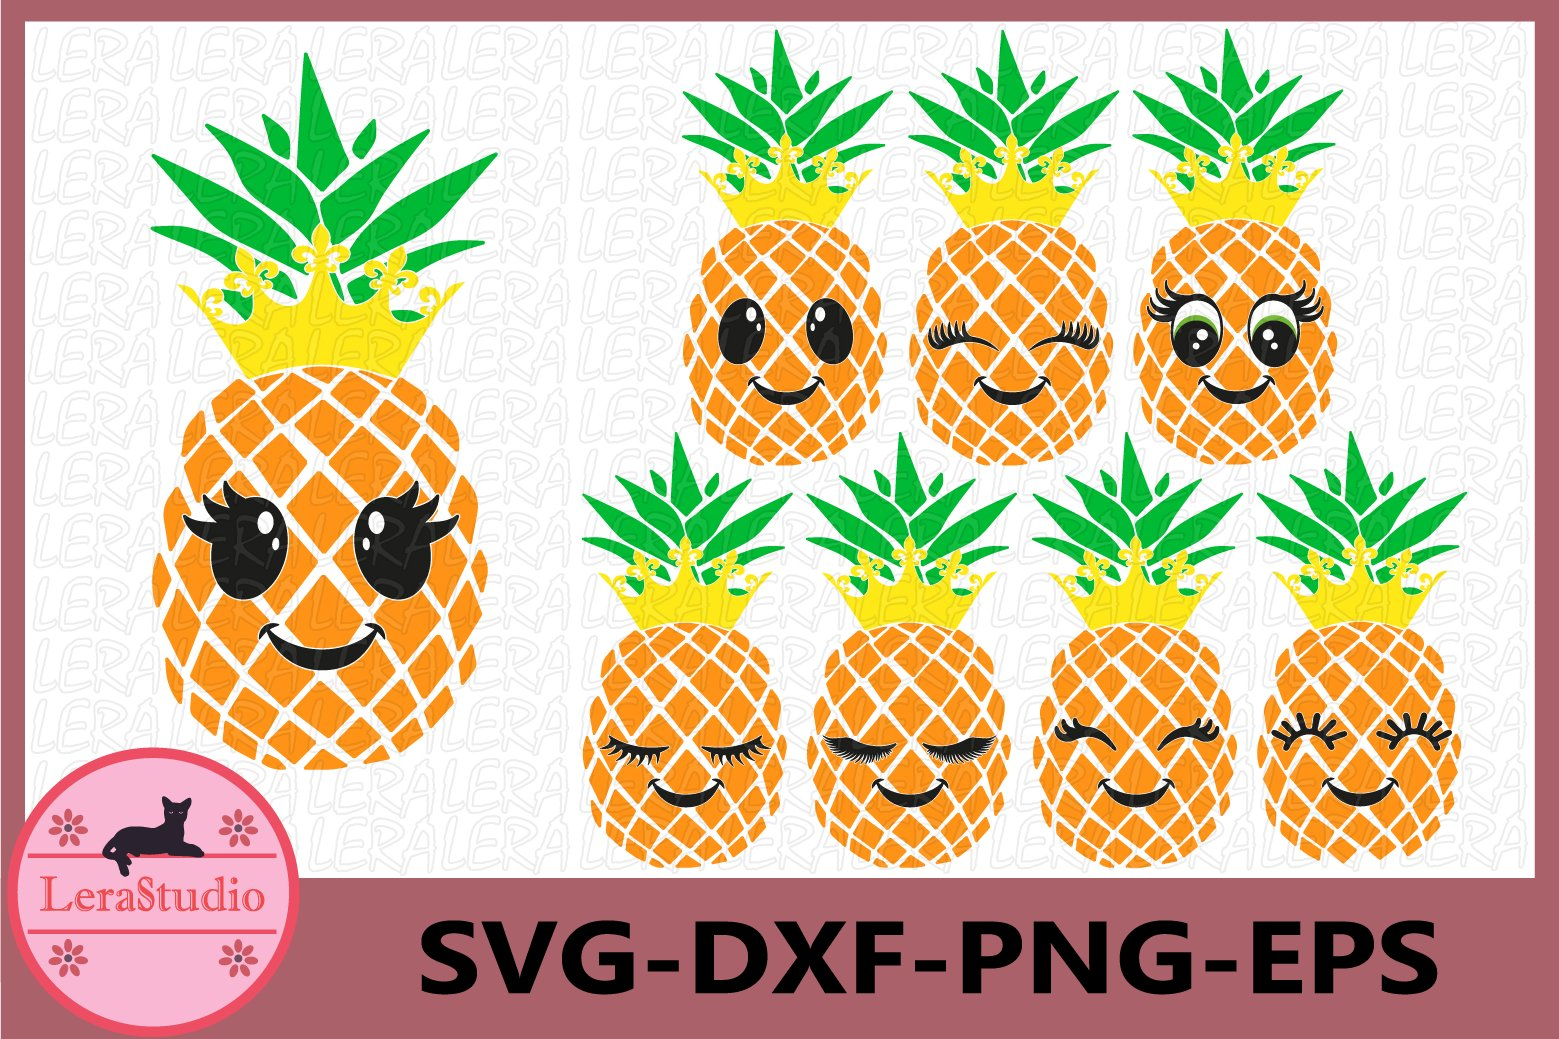 Pineapple face Svg, Pineapples SVG, Eyelashes SVG, Crown ...